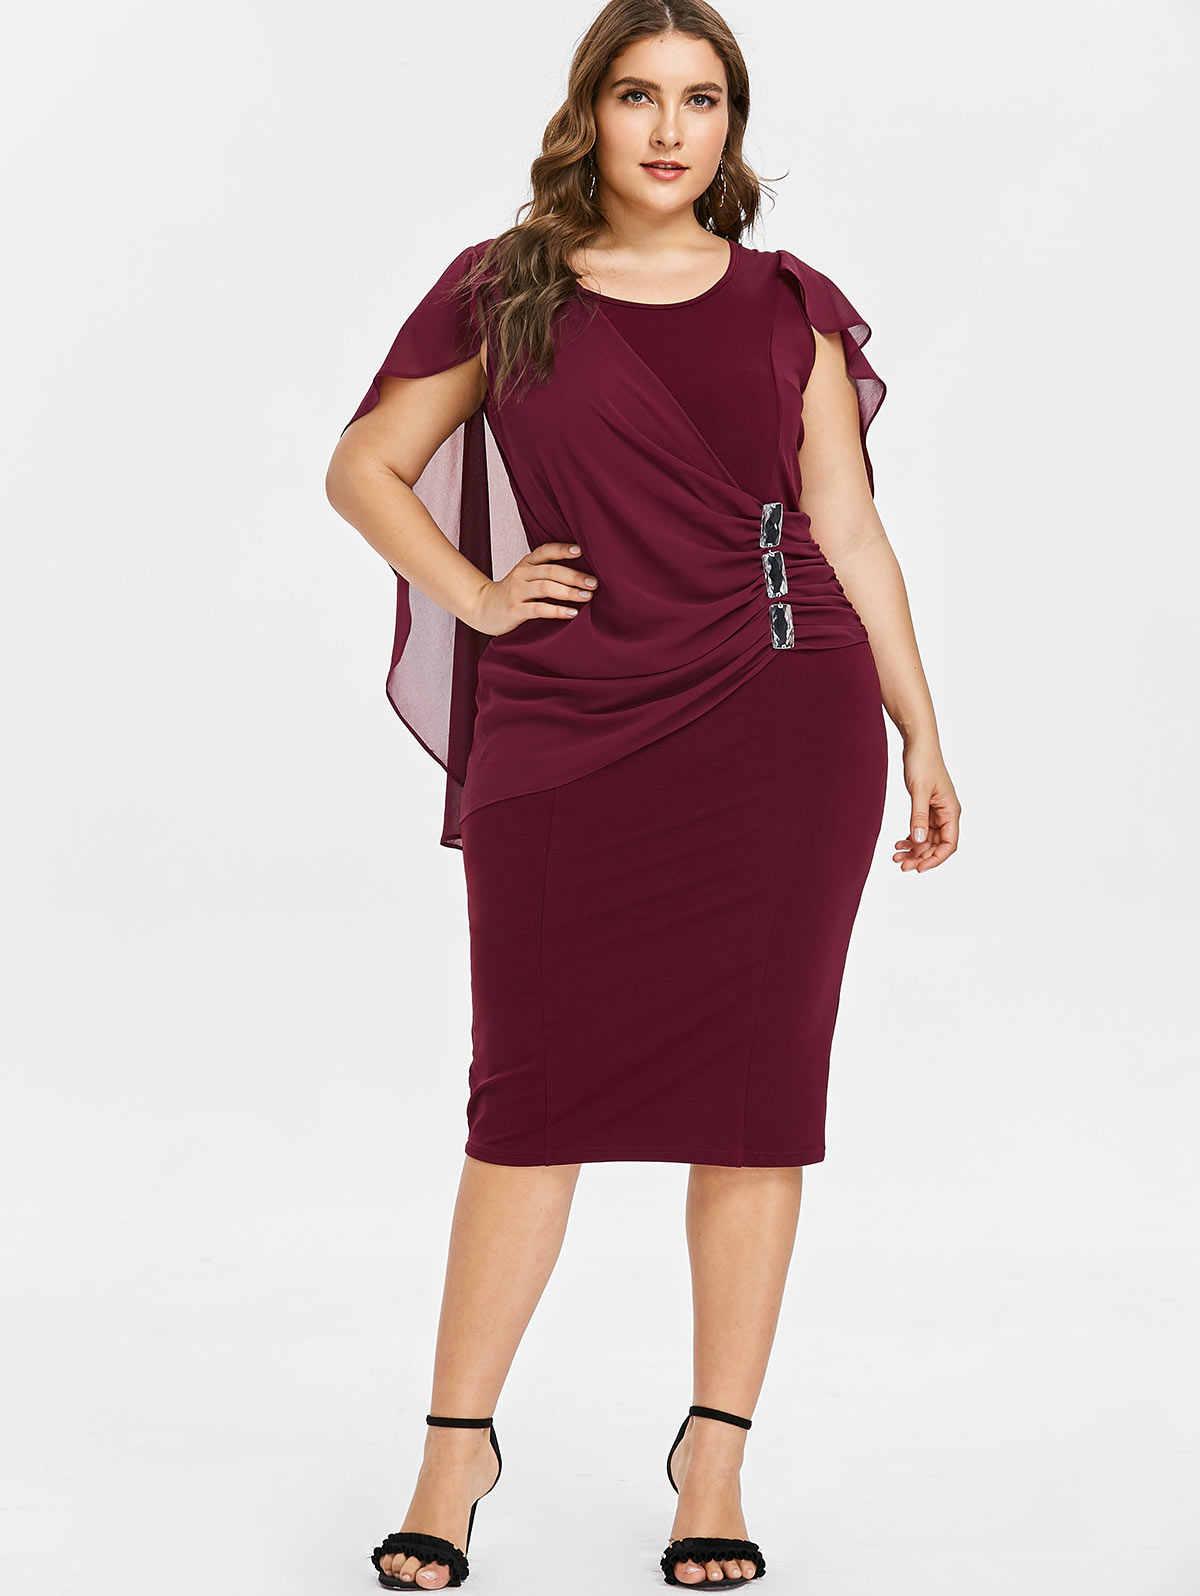 Wipalo Plus Size 5XL Capelet Knee Length Fitted Party Dress Women  Sleeveless Scoop Neck Sheath Dress c3daadcd54fe